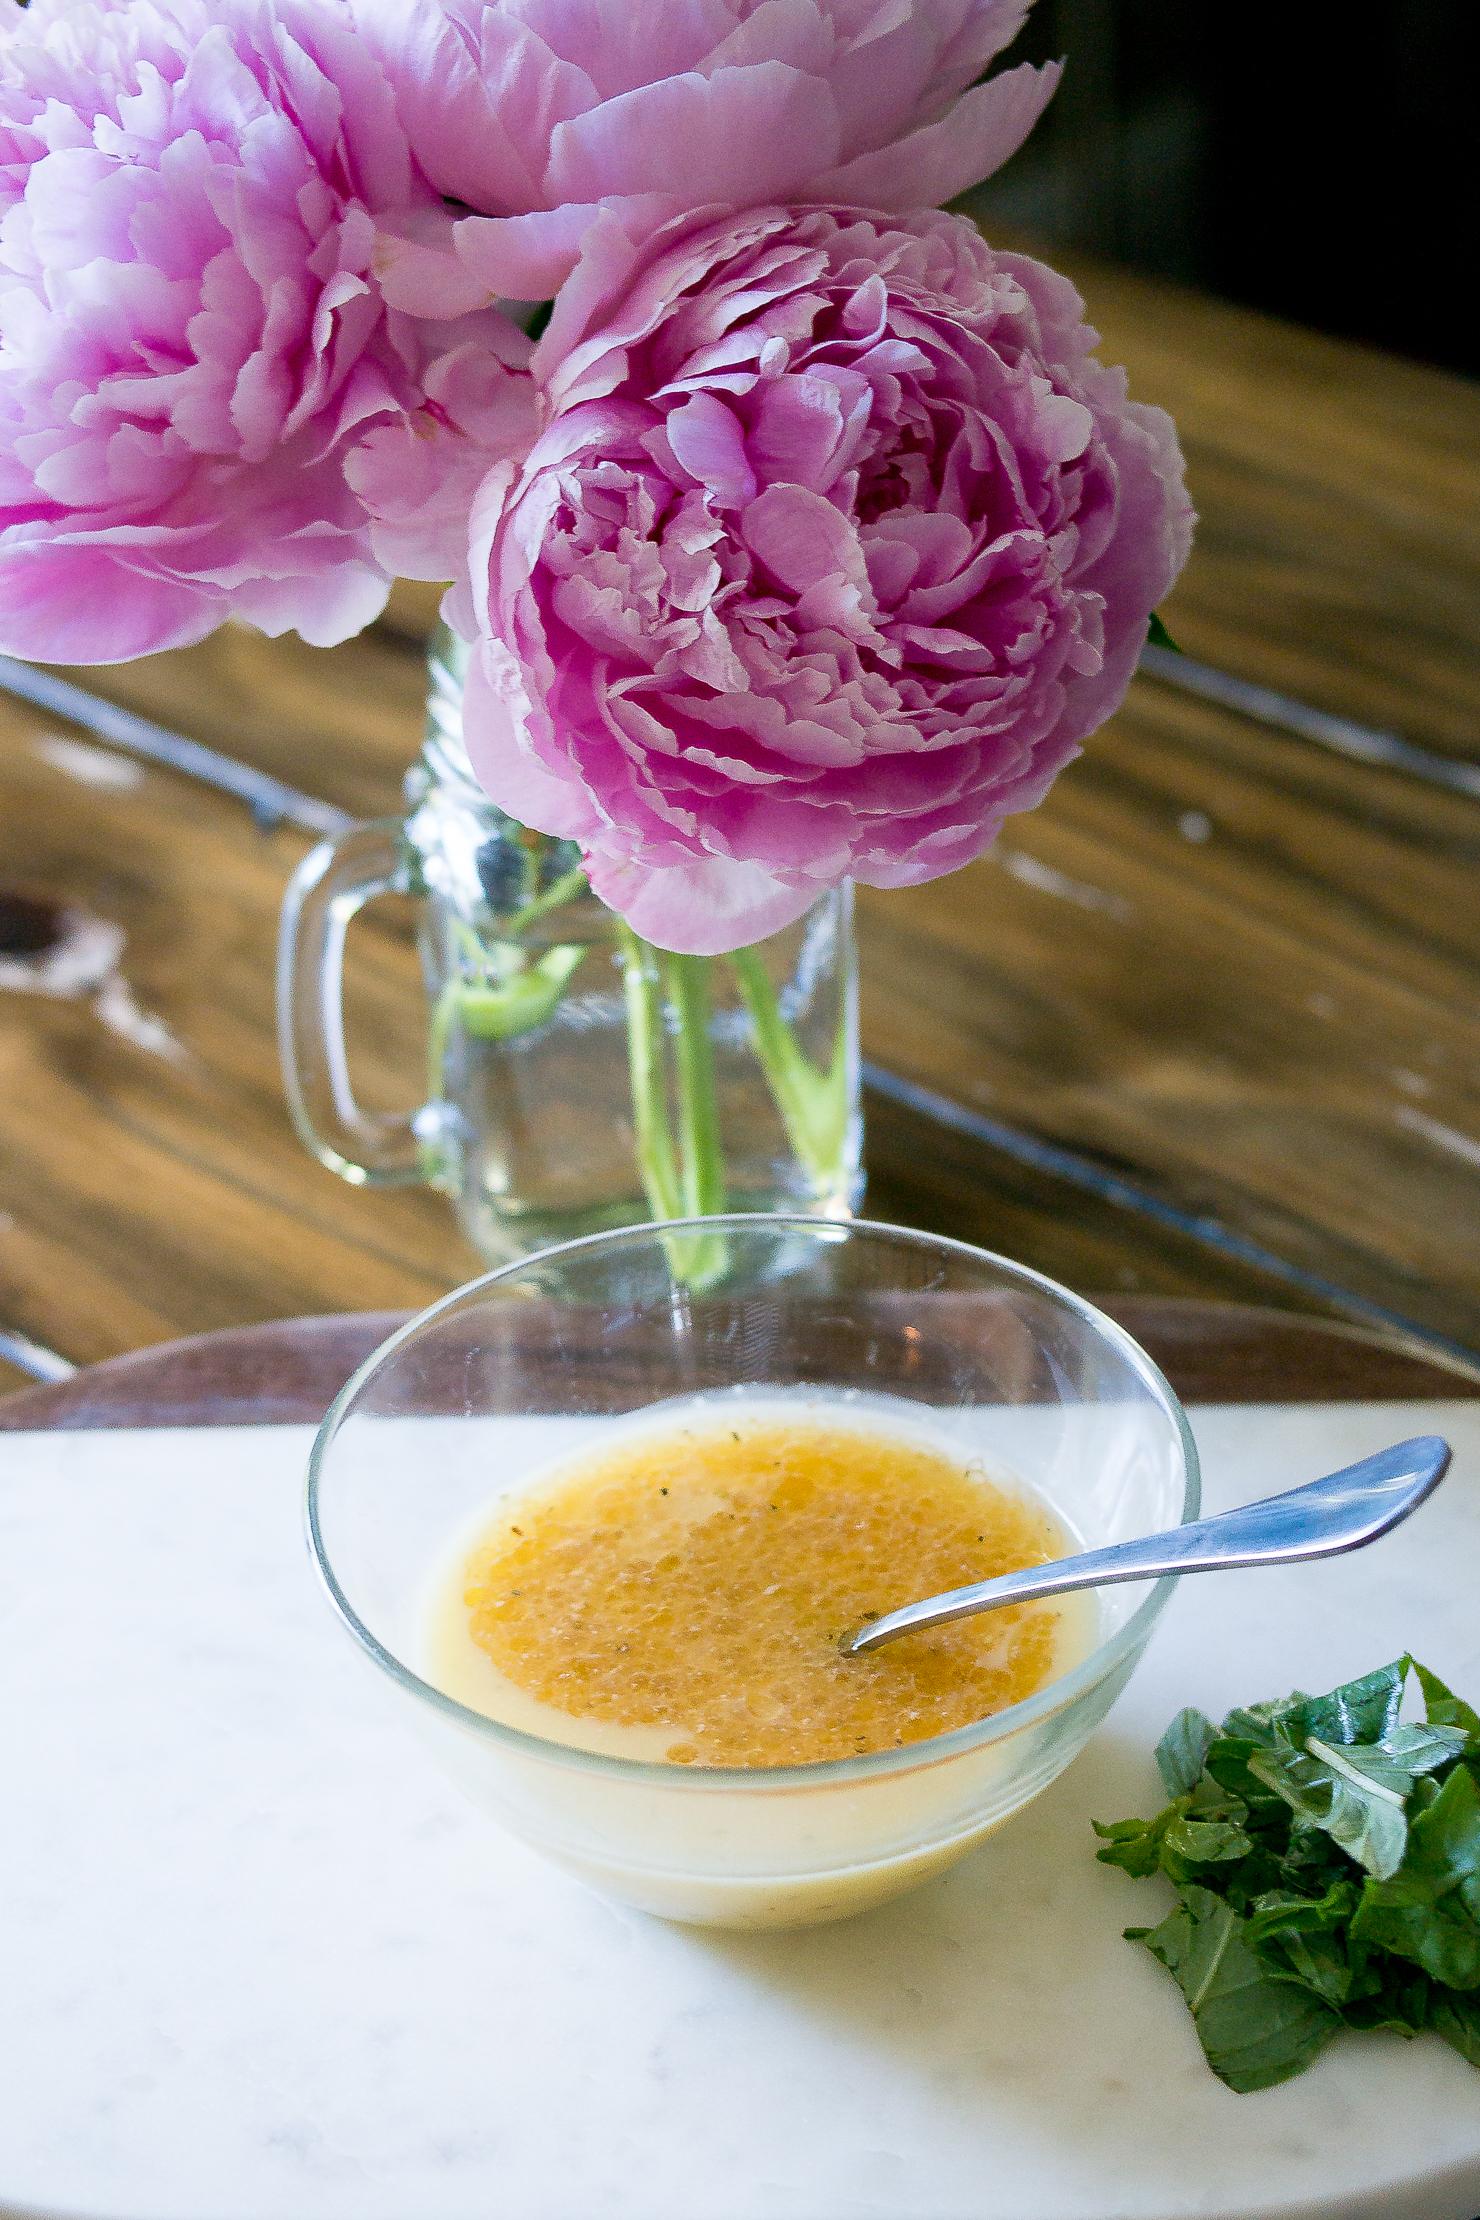 garlicy pasta salad dressing